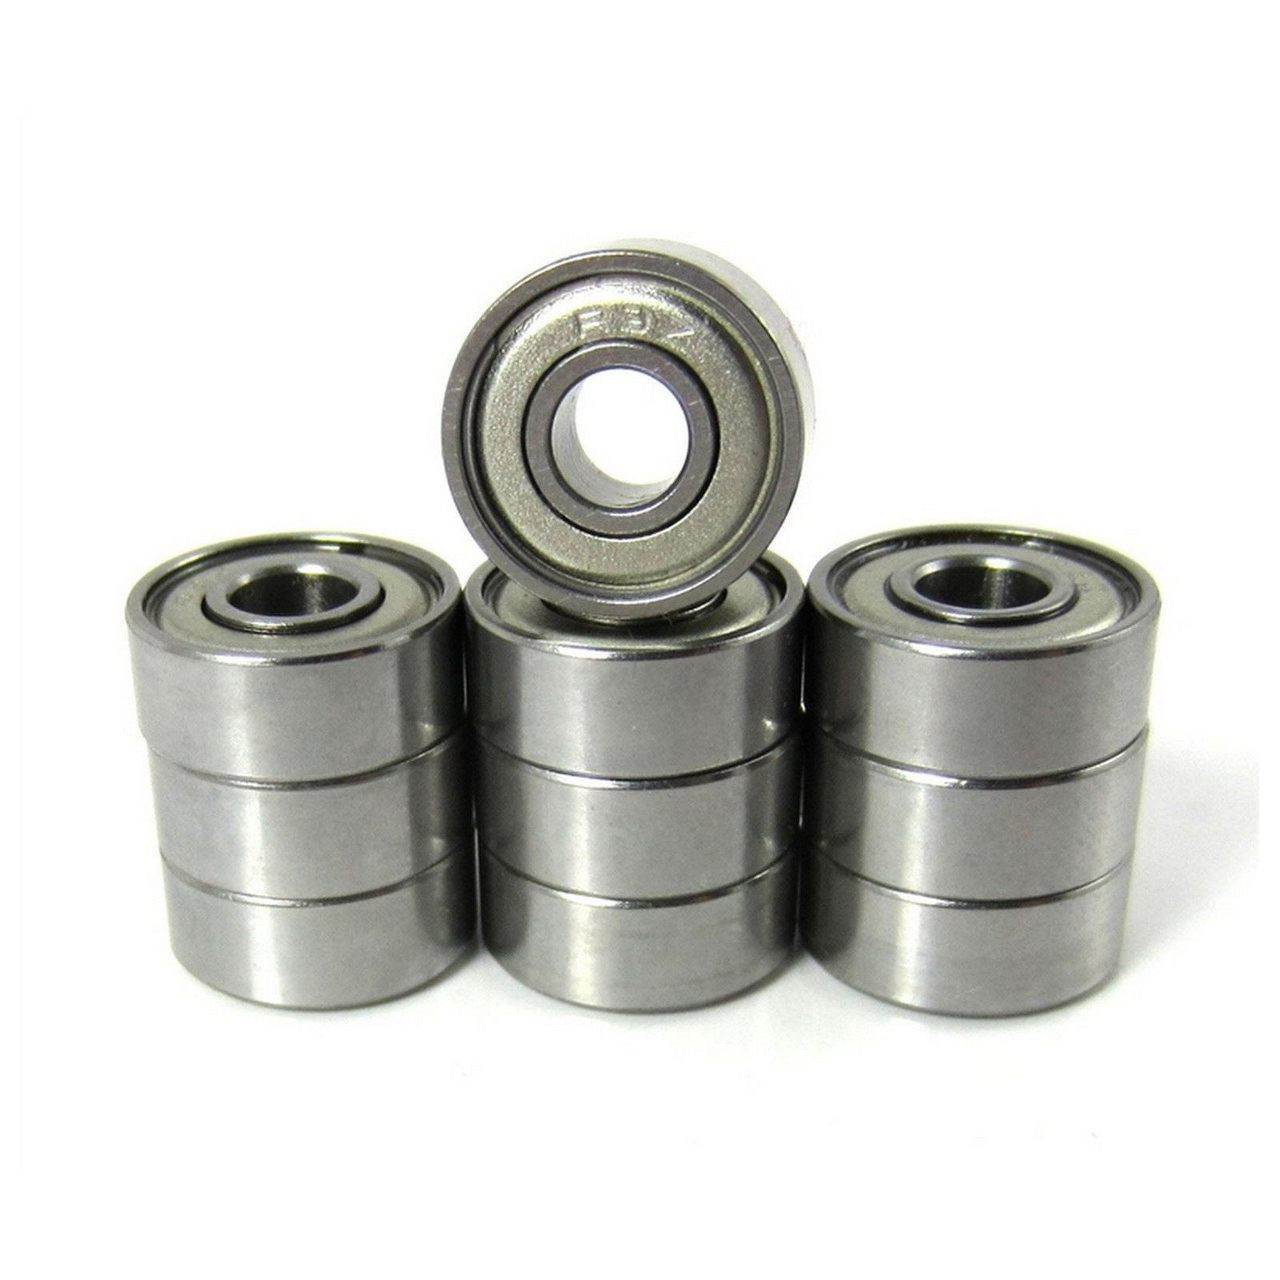 3/16x1/2x49/250 Precision Ceramic Ball Bearings Metal Shields (10)